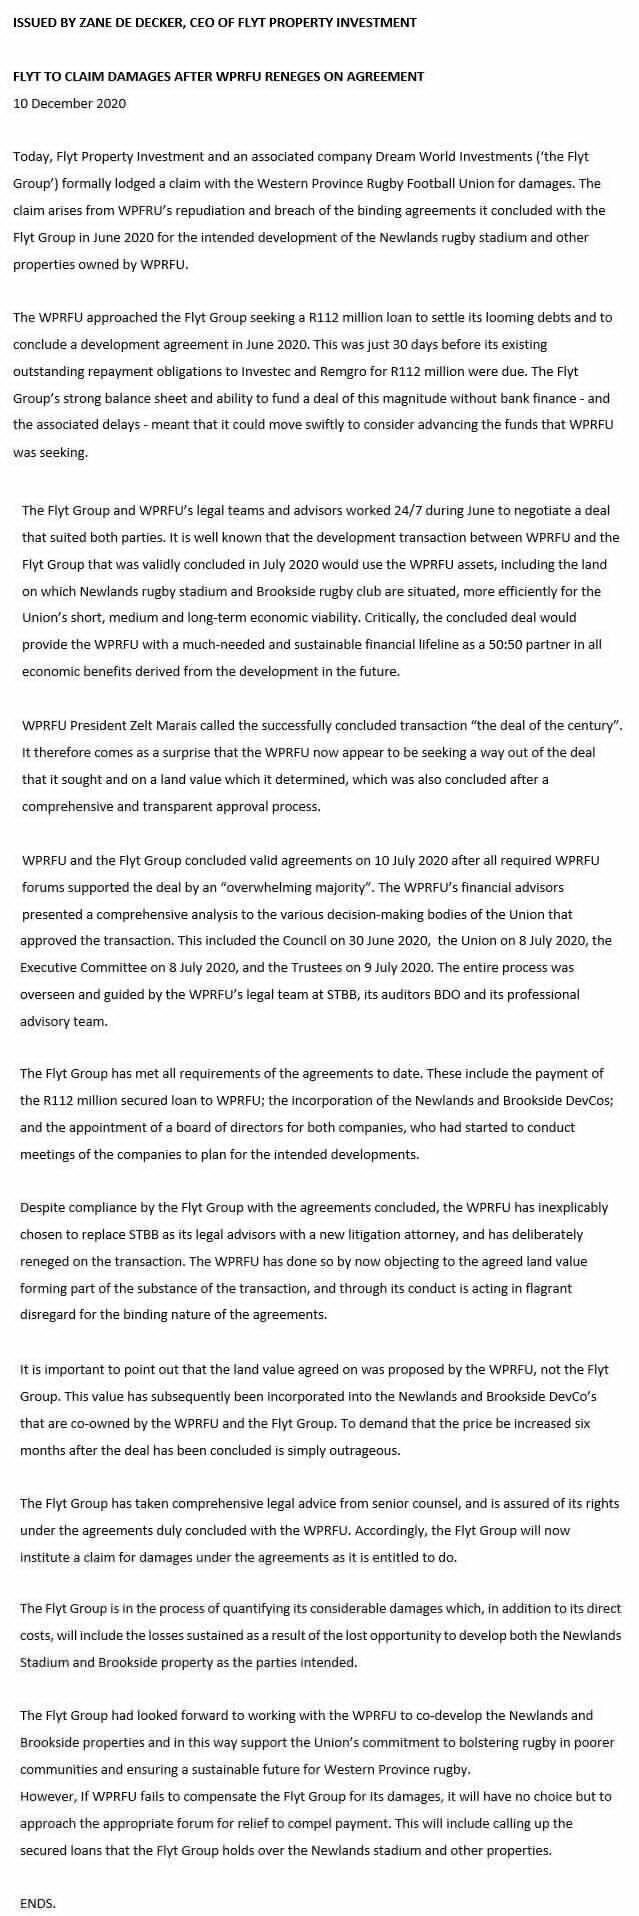 Zane-de-Decker-statement---10-December-2020